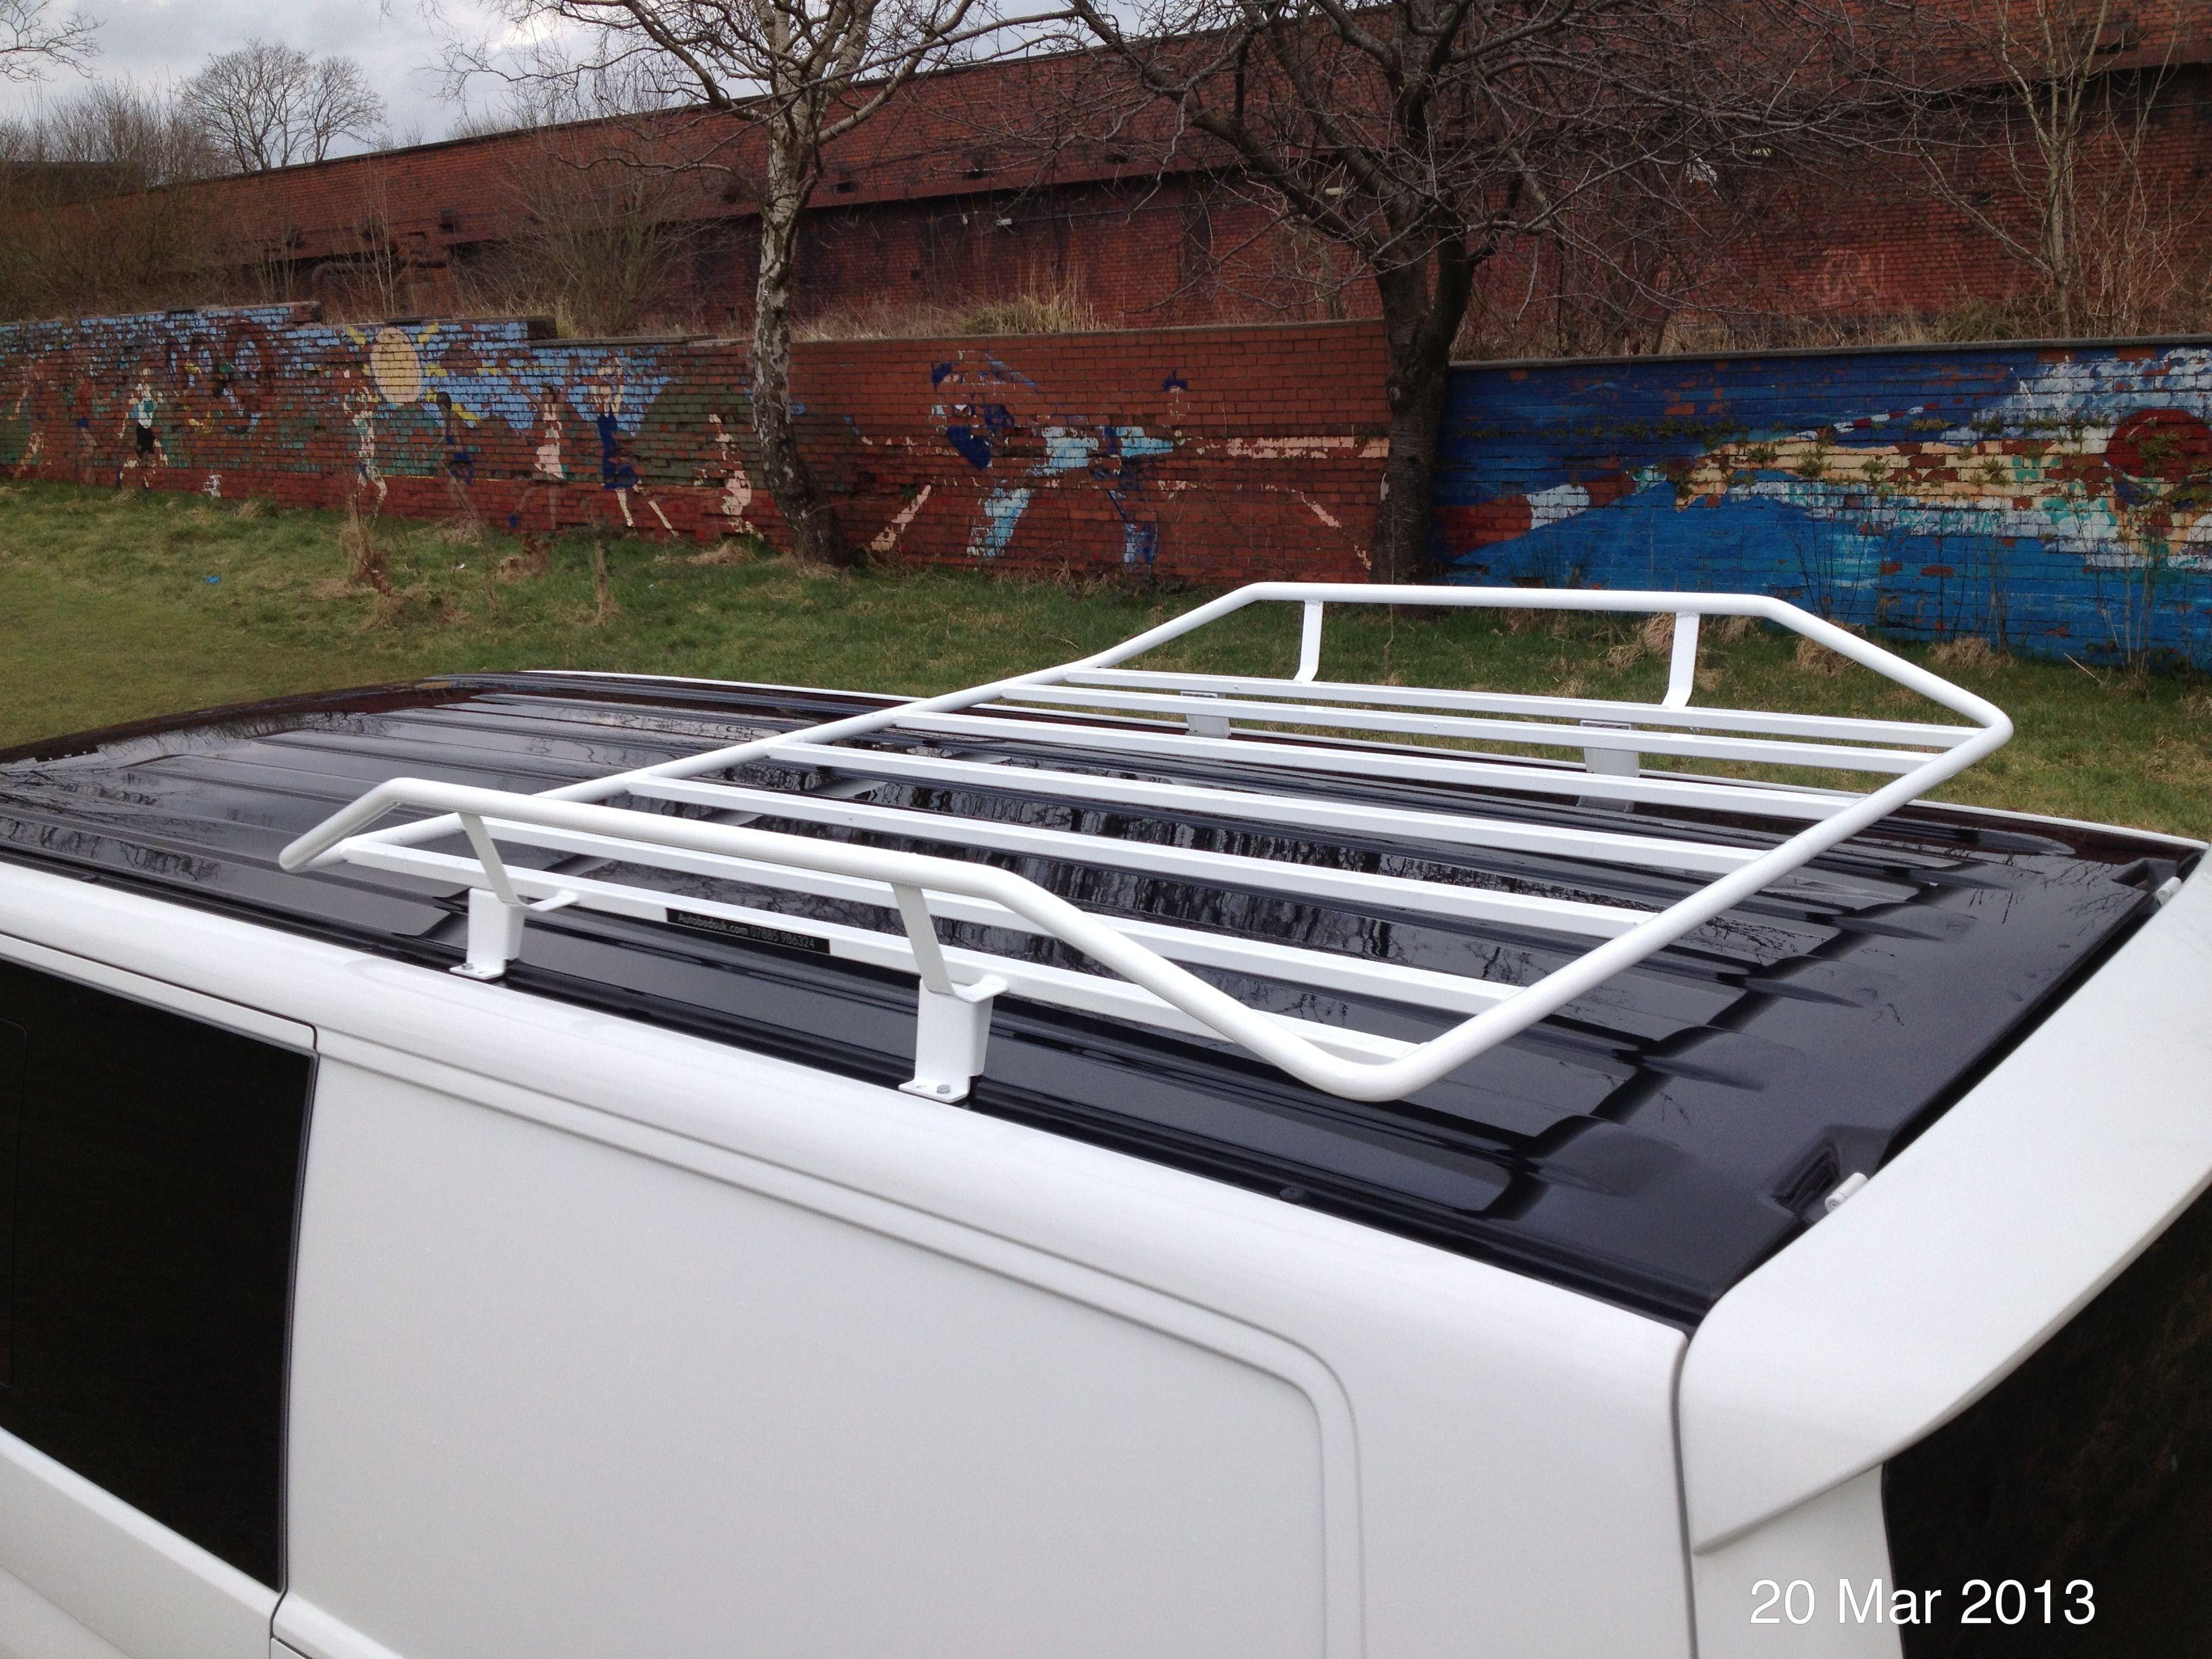 T4 Amp T5 Roof Racks Vw T4 Forum Vw T5 Forum Camper